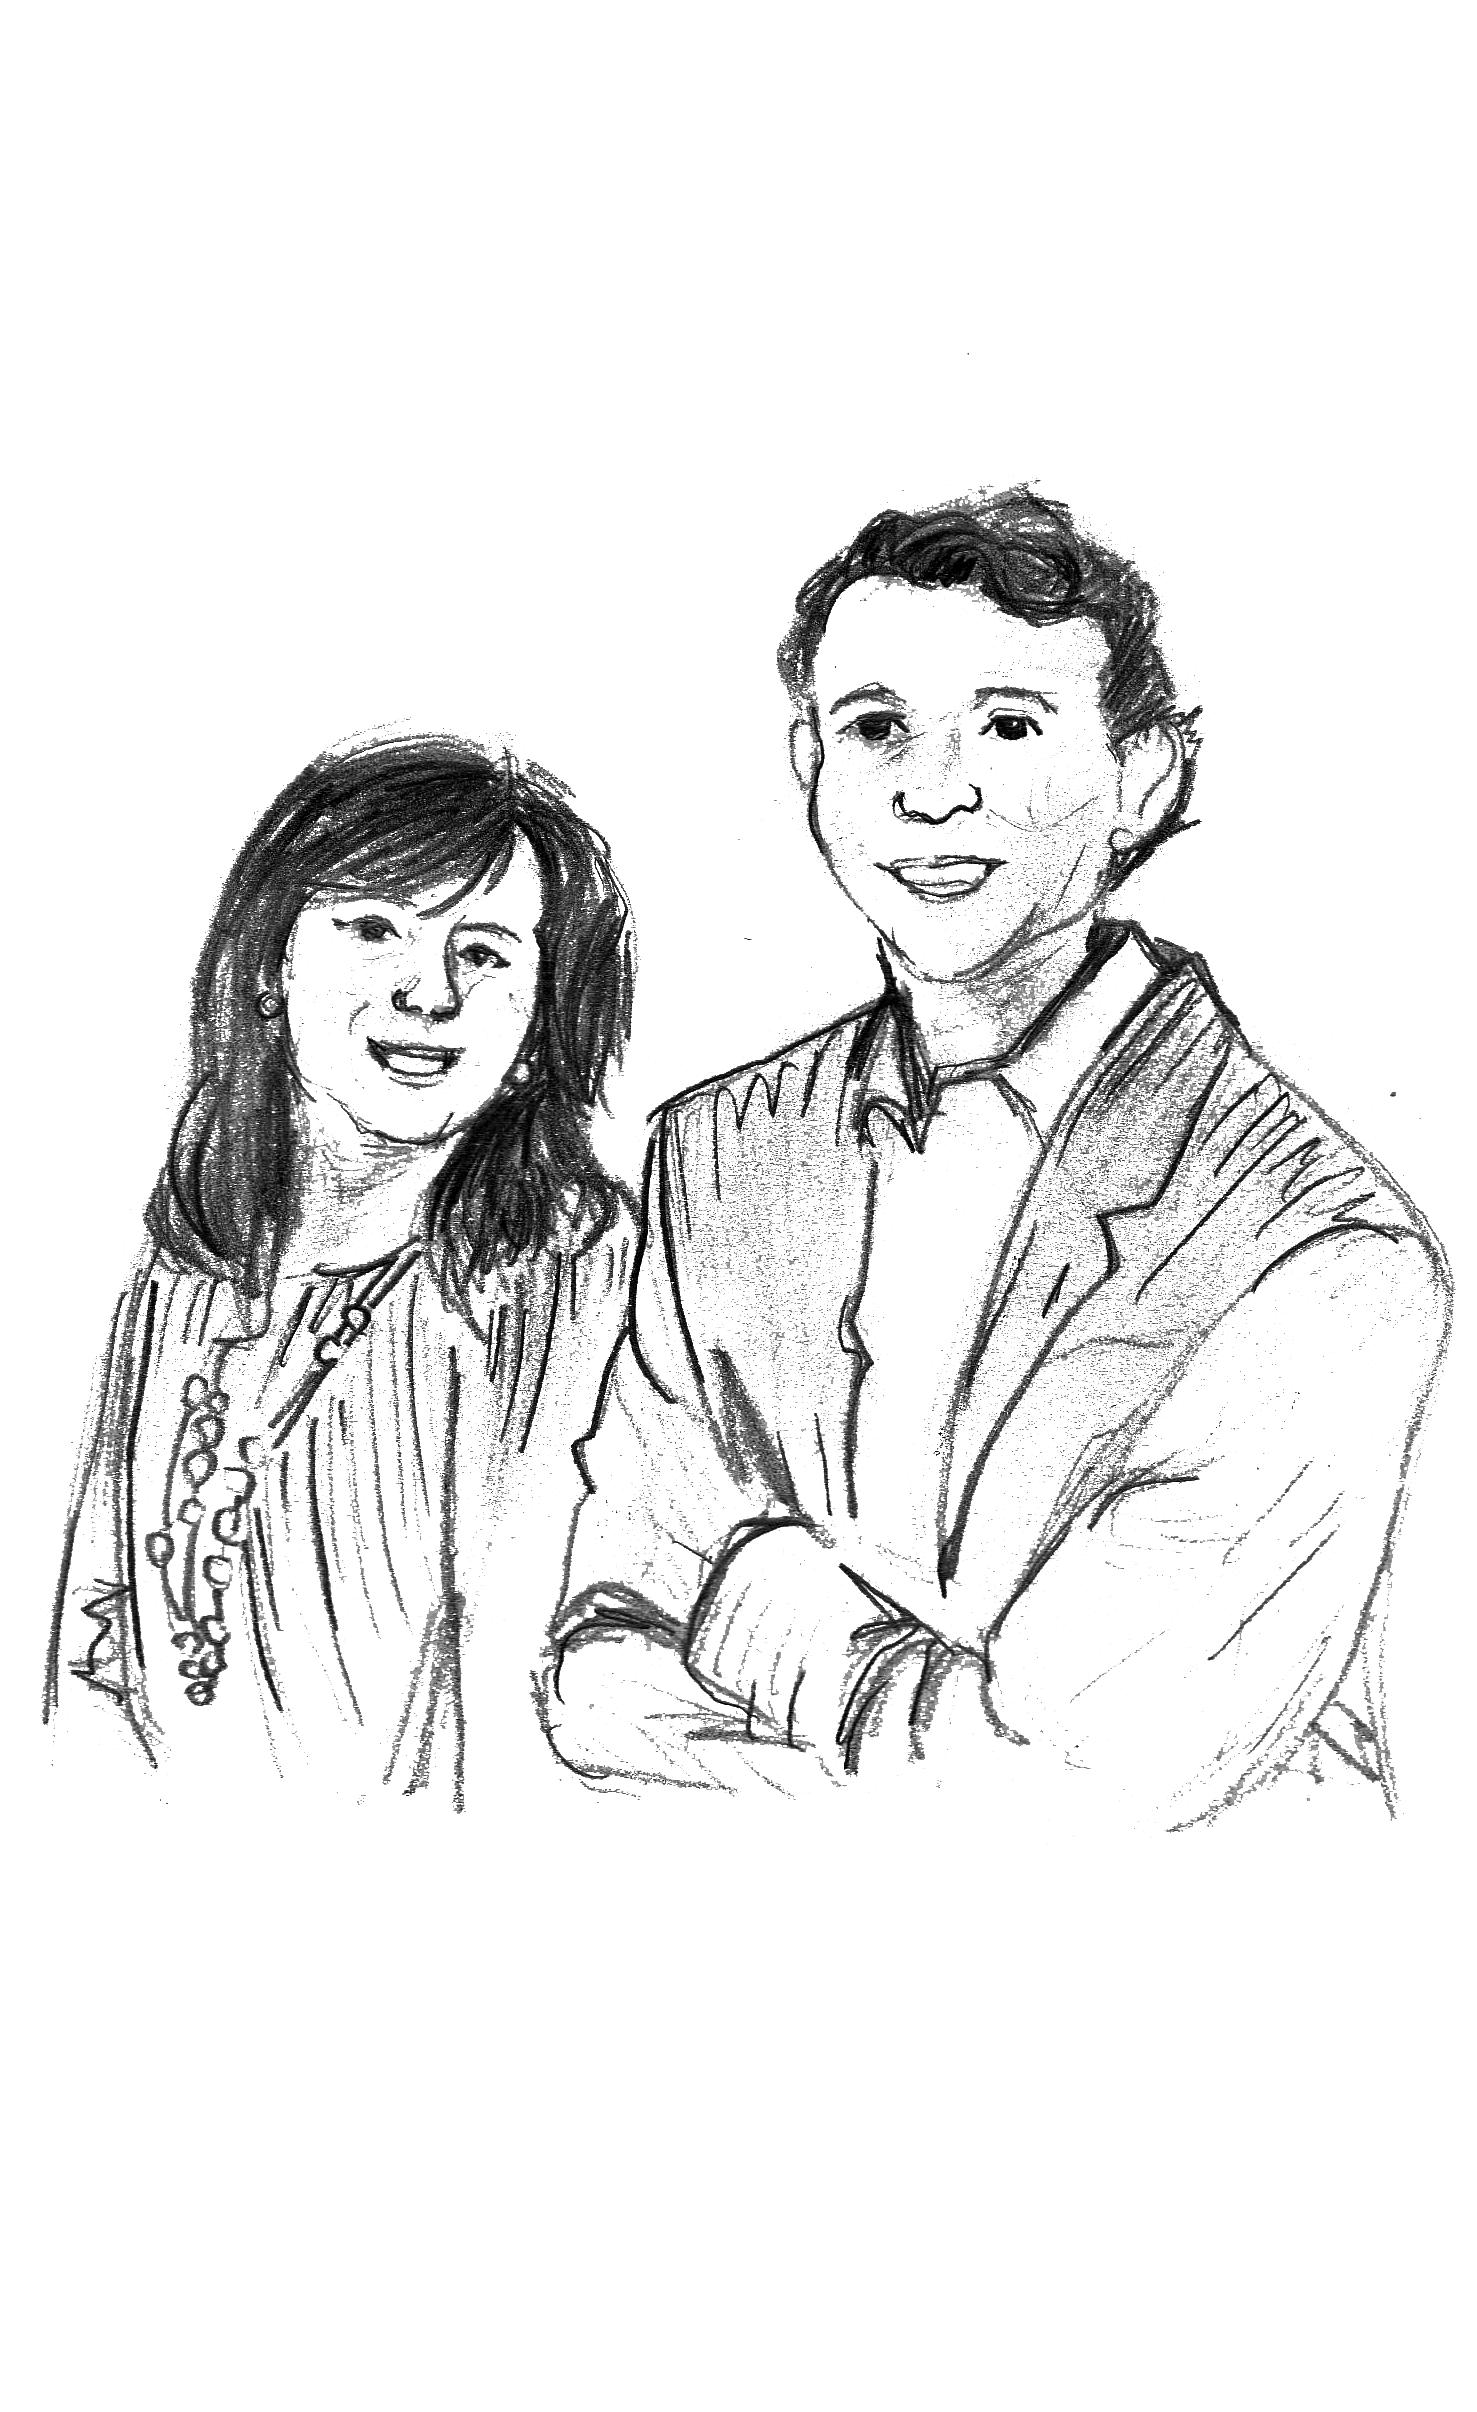 MORRIS & WEBER: For GU Perfectionists, a Fresh Take on Failure